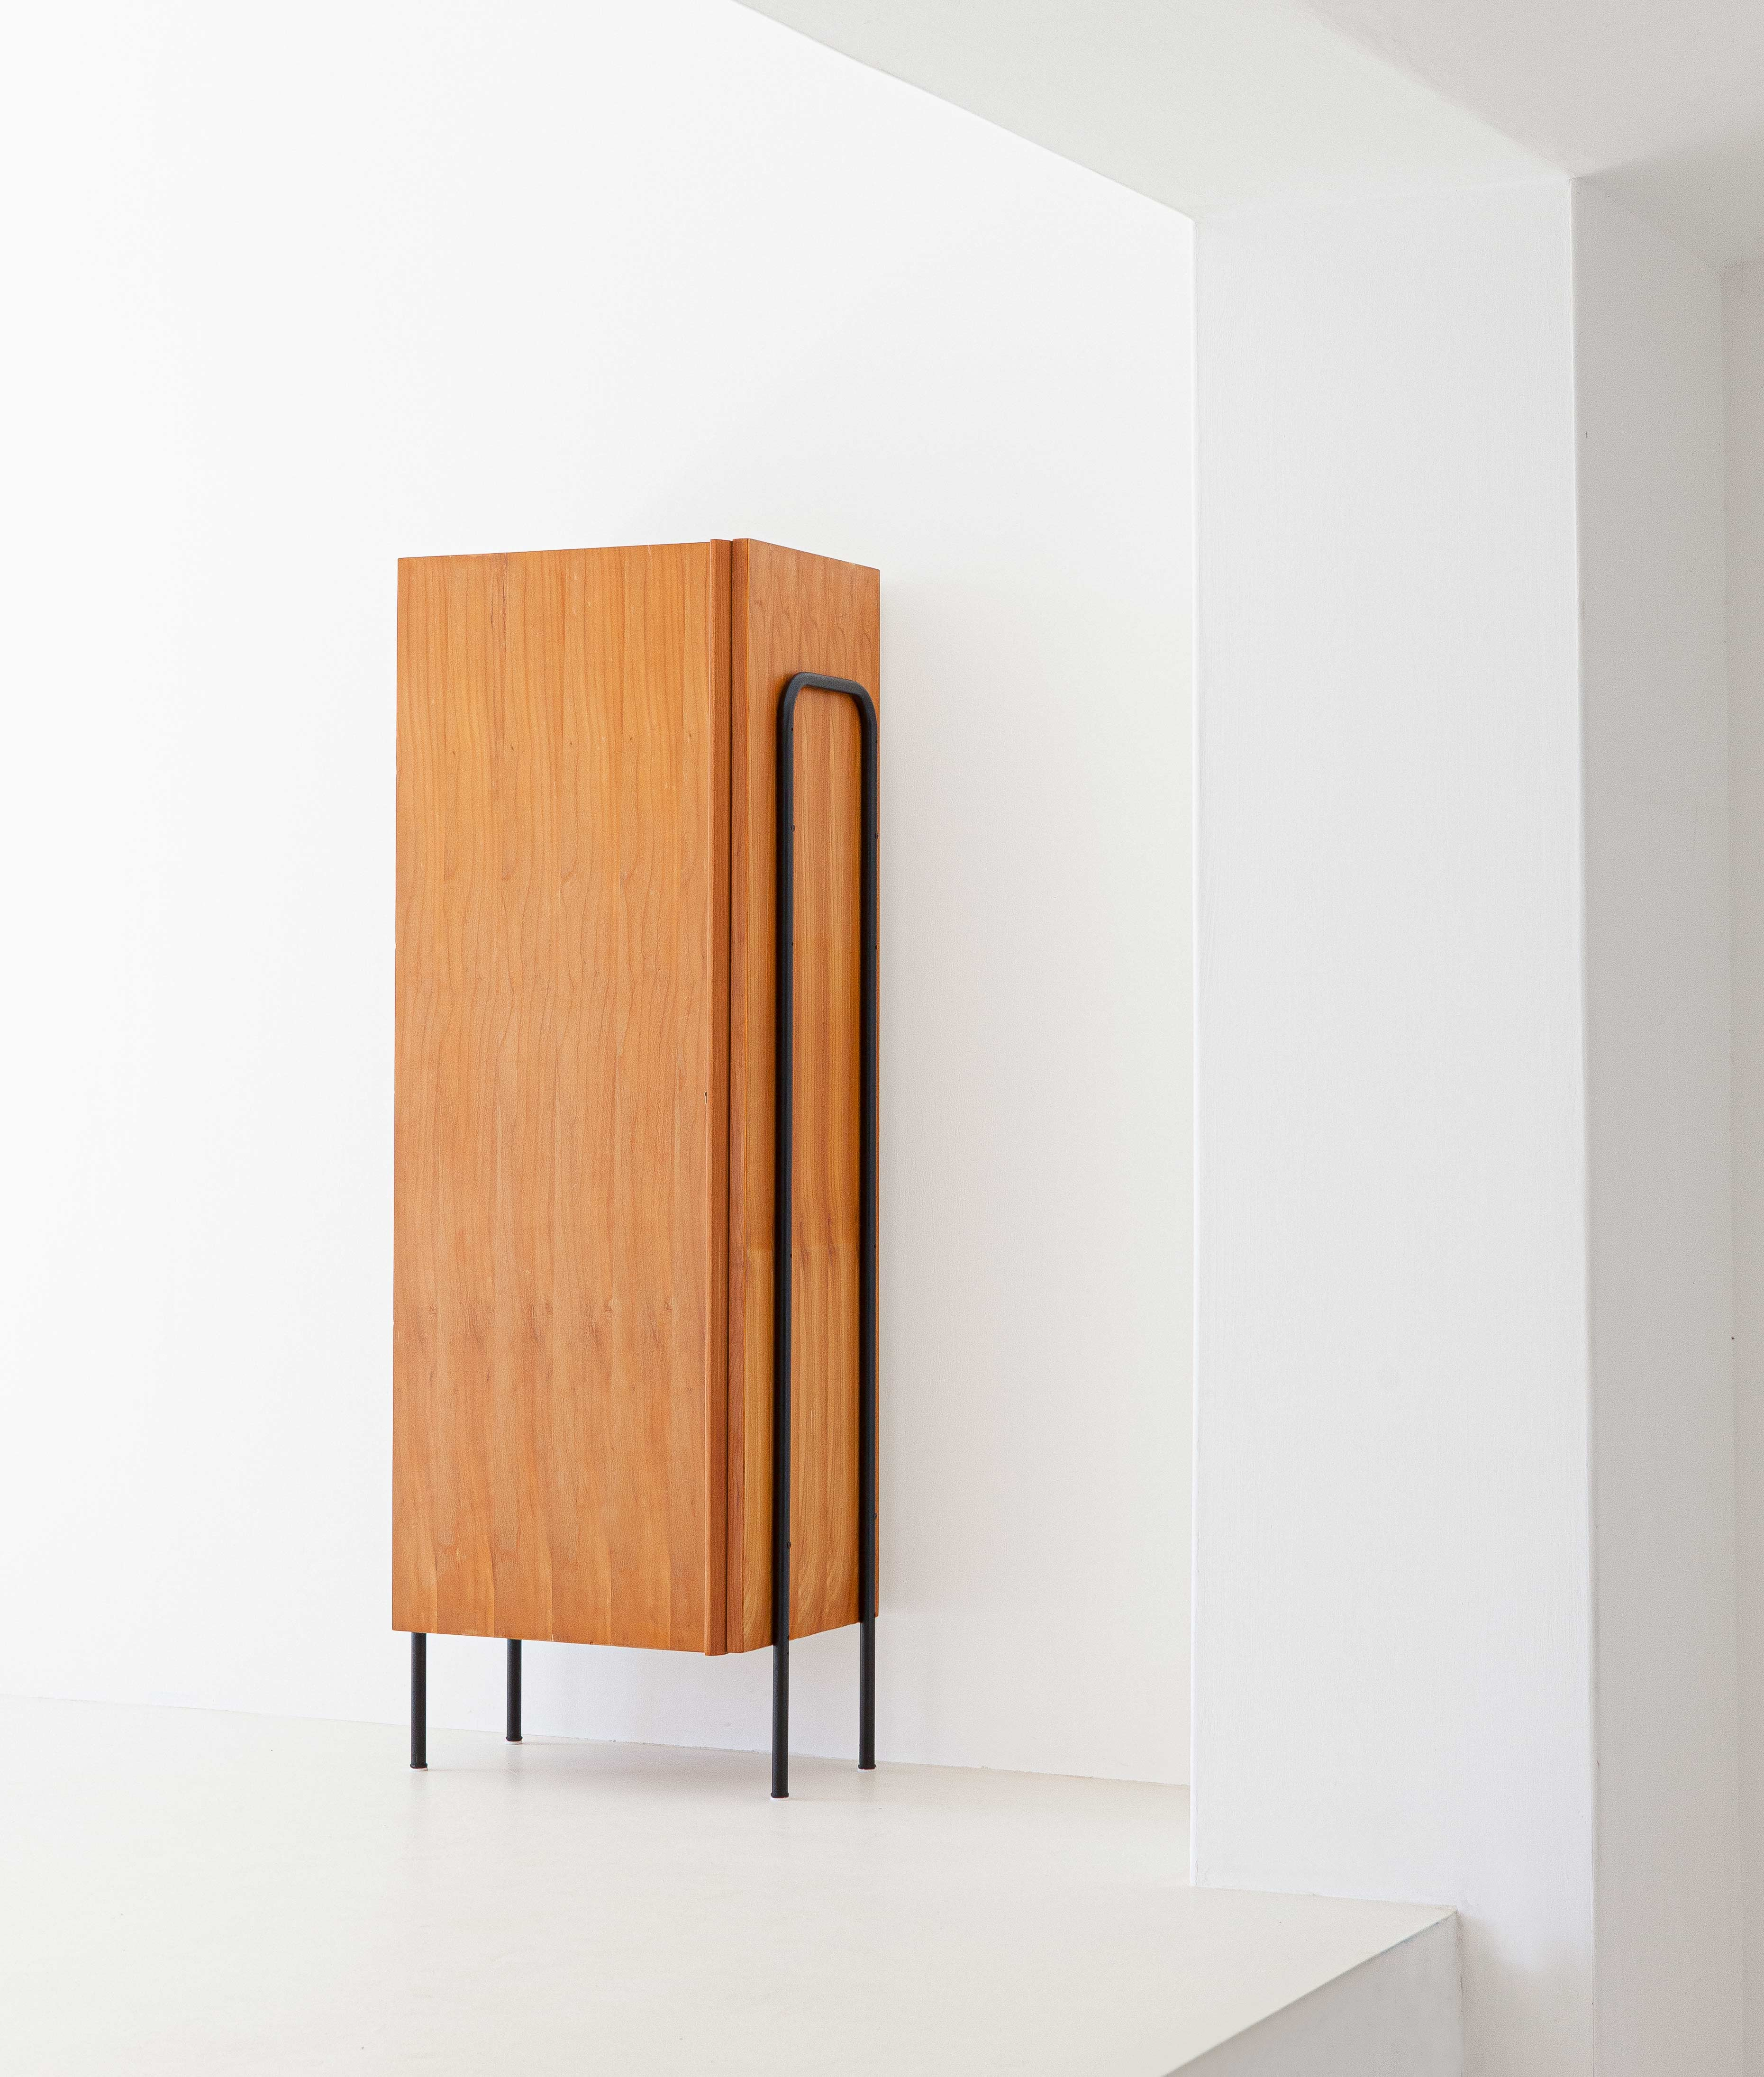 1950s-italian-light-wood-and-iron-wardrobe-cabinet-2-st114